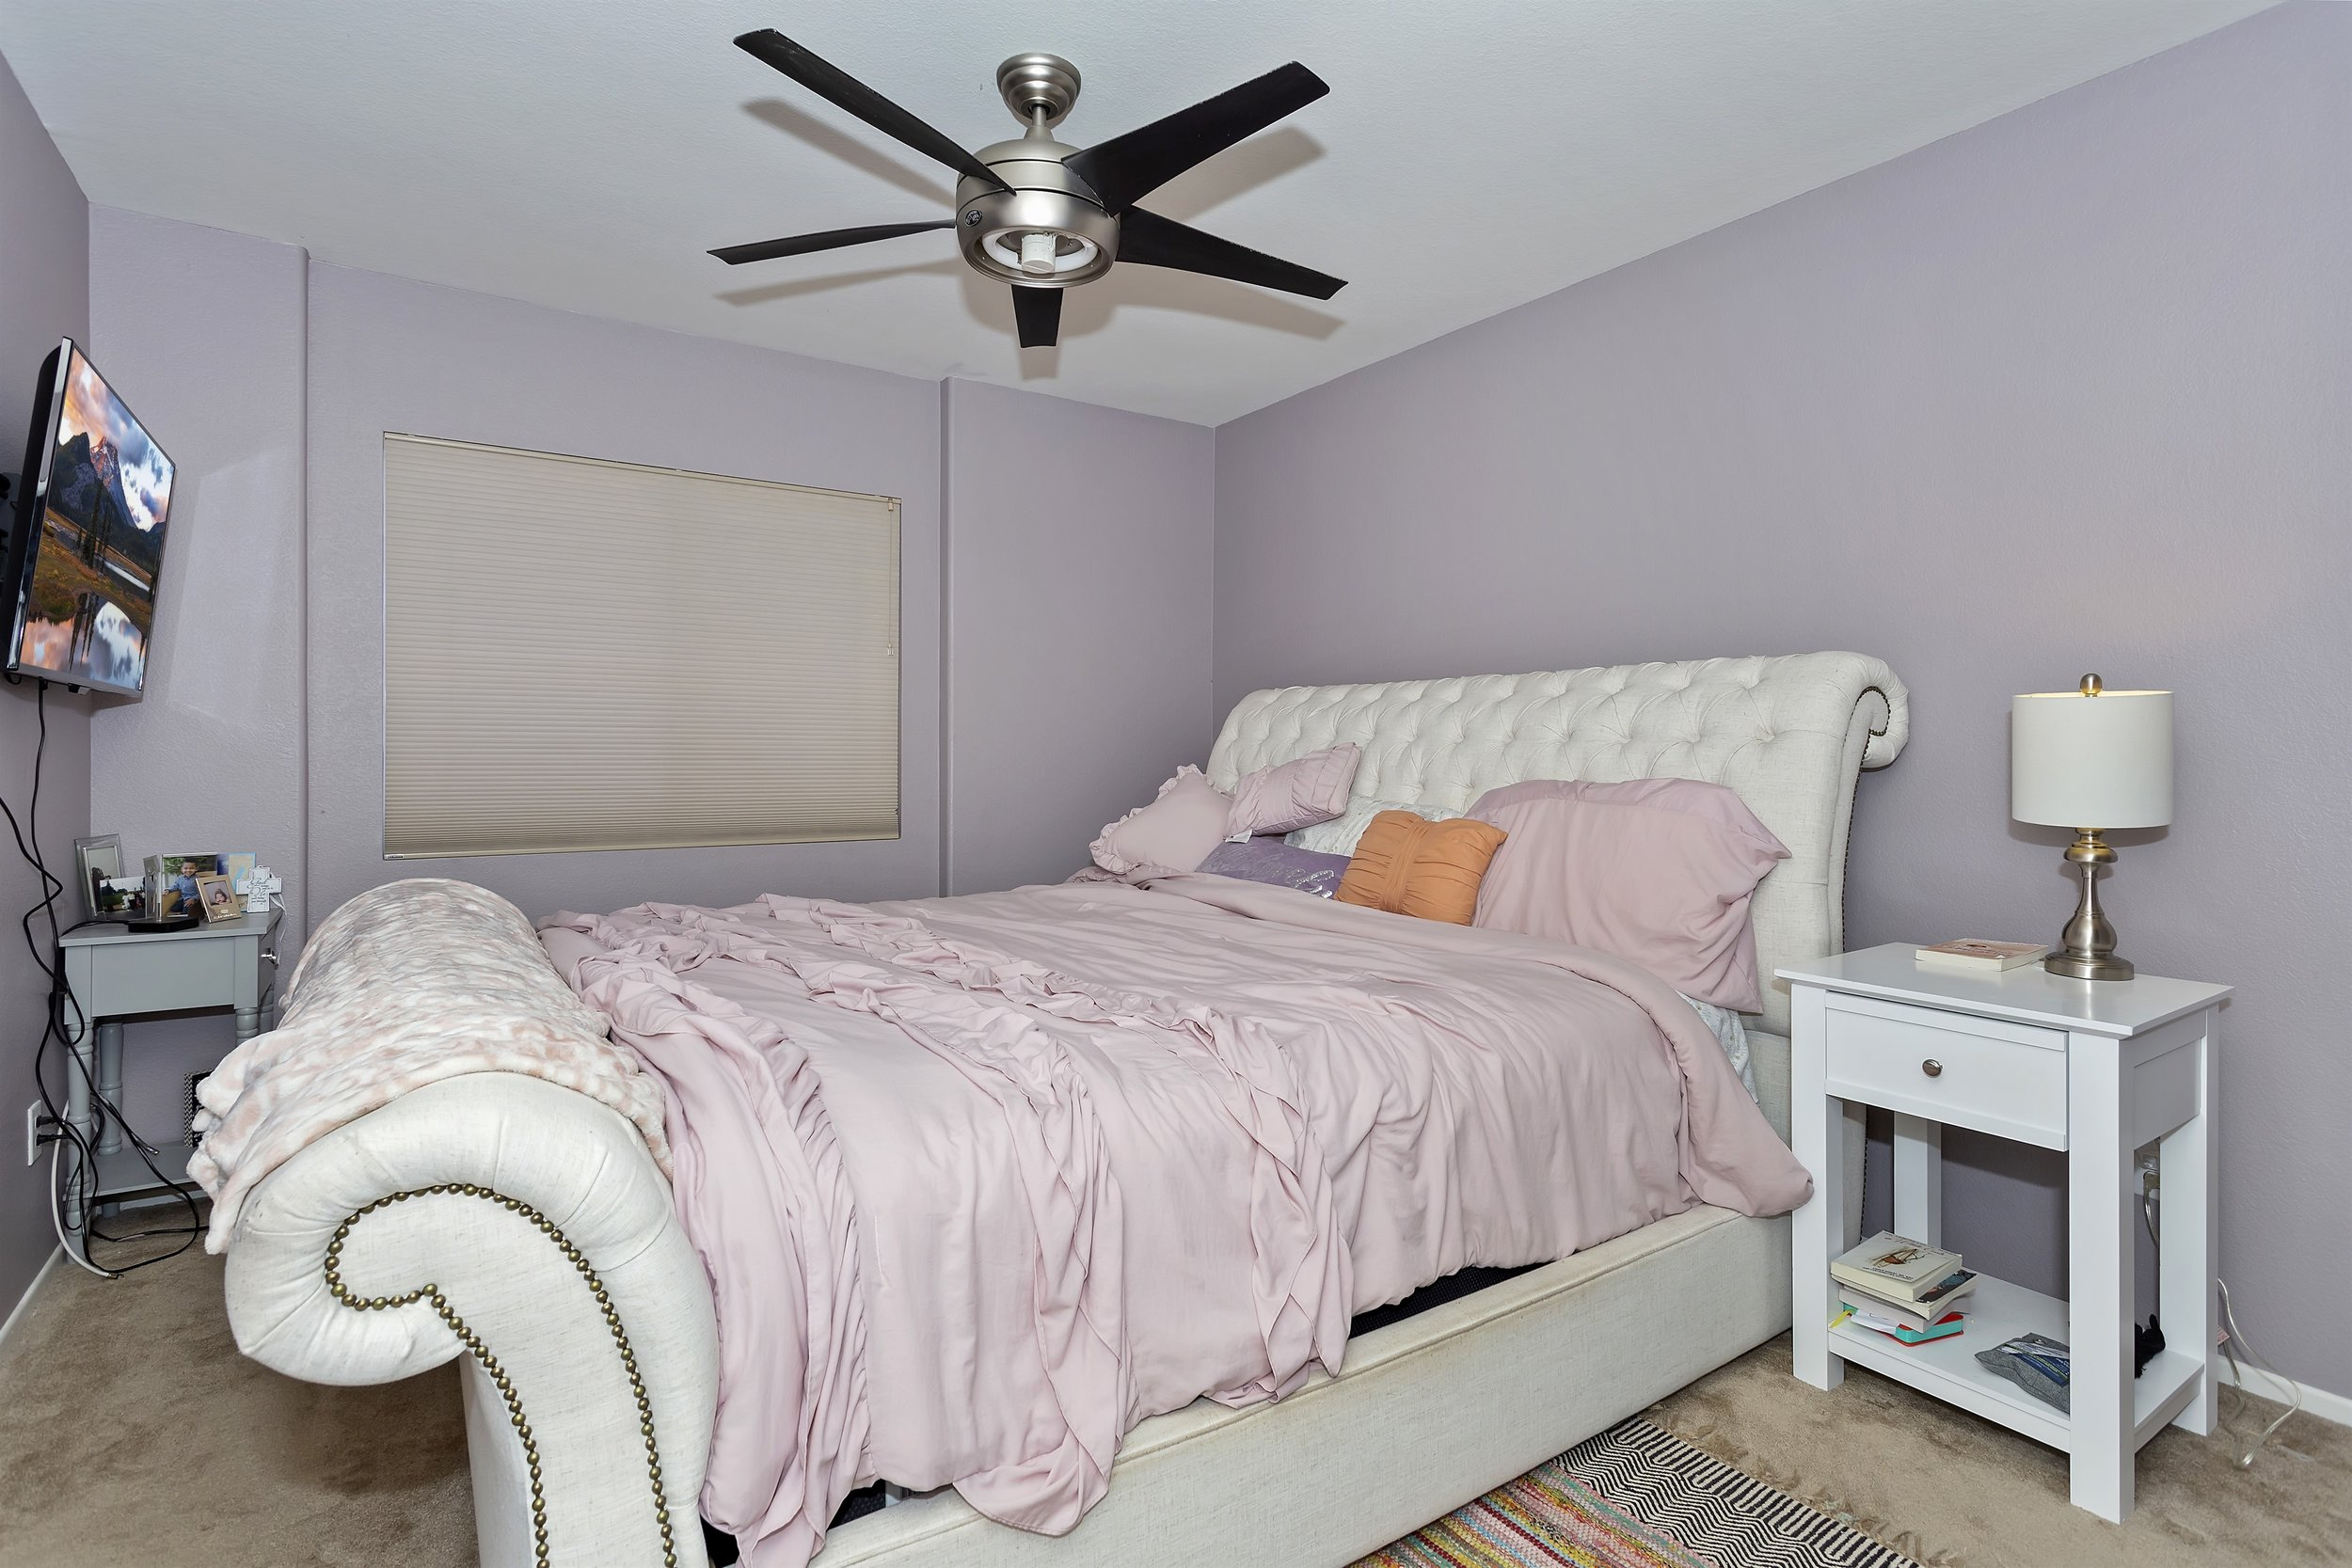 022_2nd Floor Master Bedroom.jpg